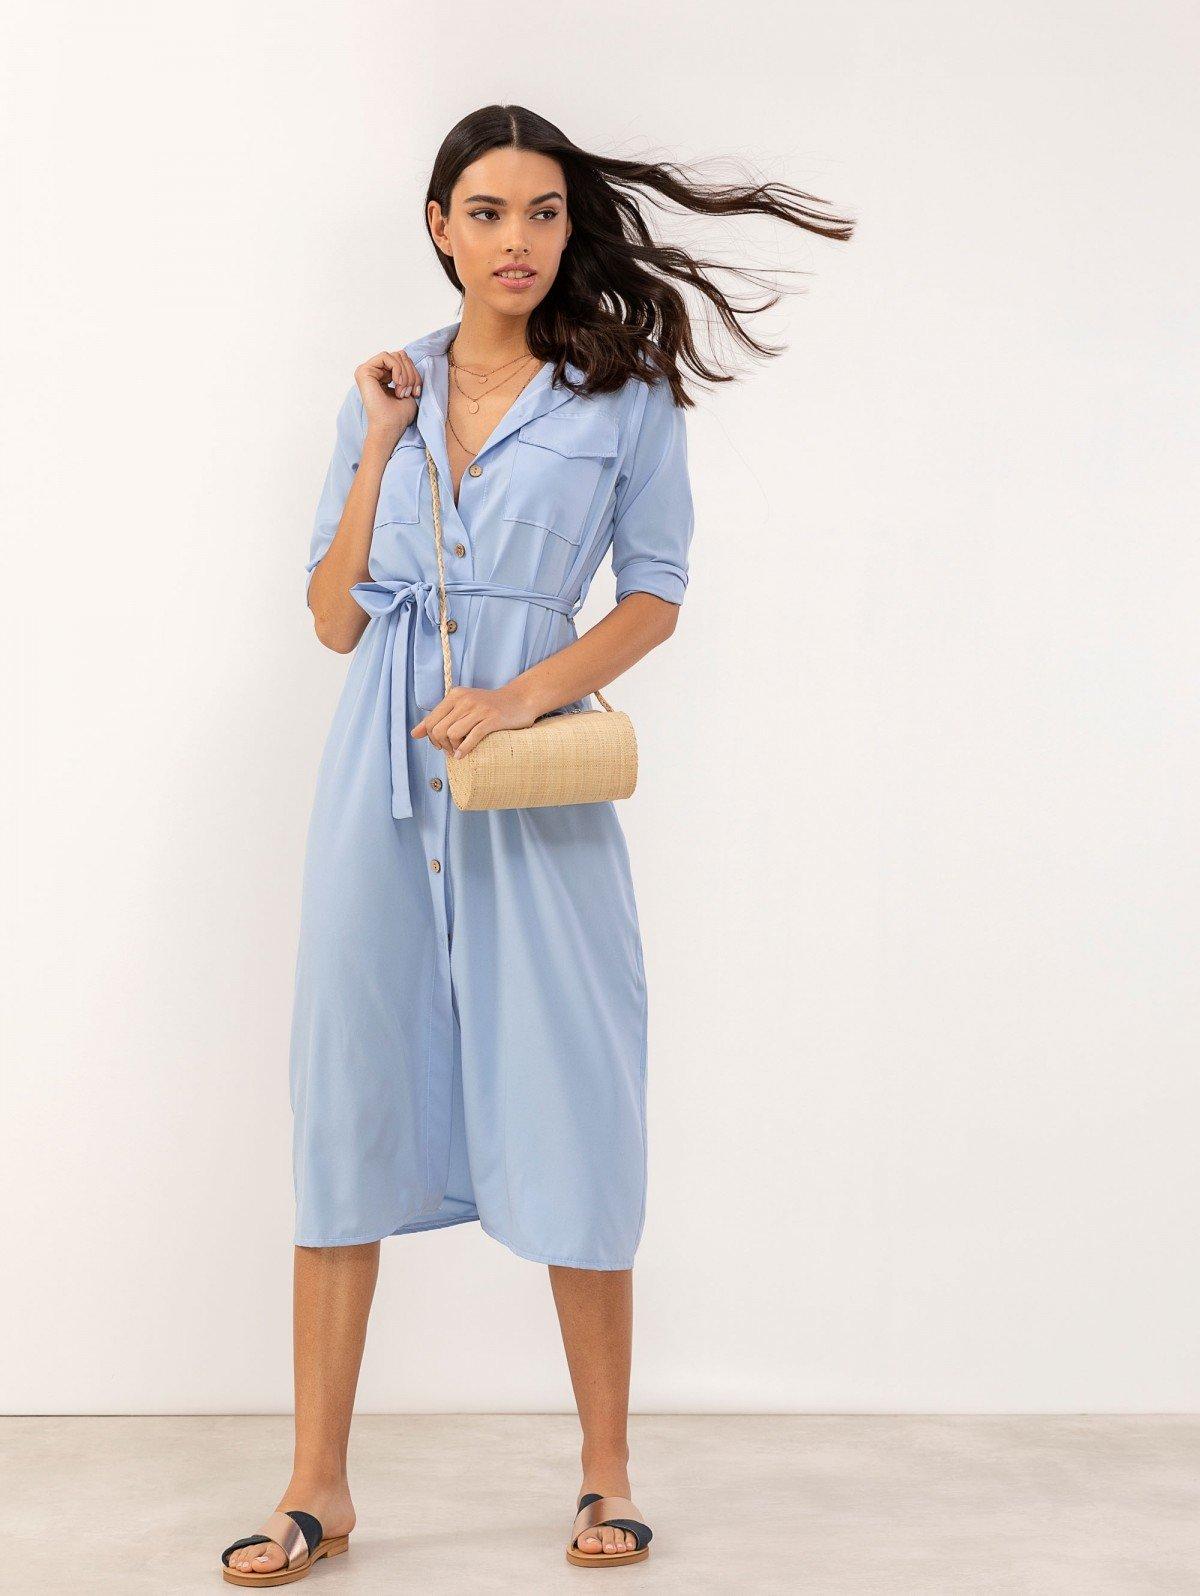 351508123172 TheFashionProject Σεμιζιέ φόρεμα με τσεπάκια - Γαλάζιο